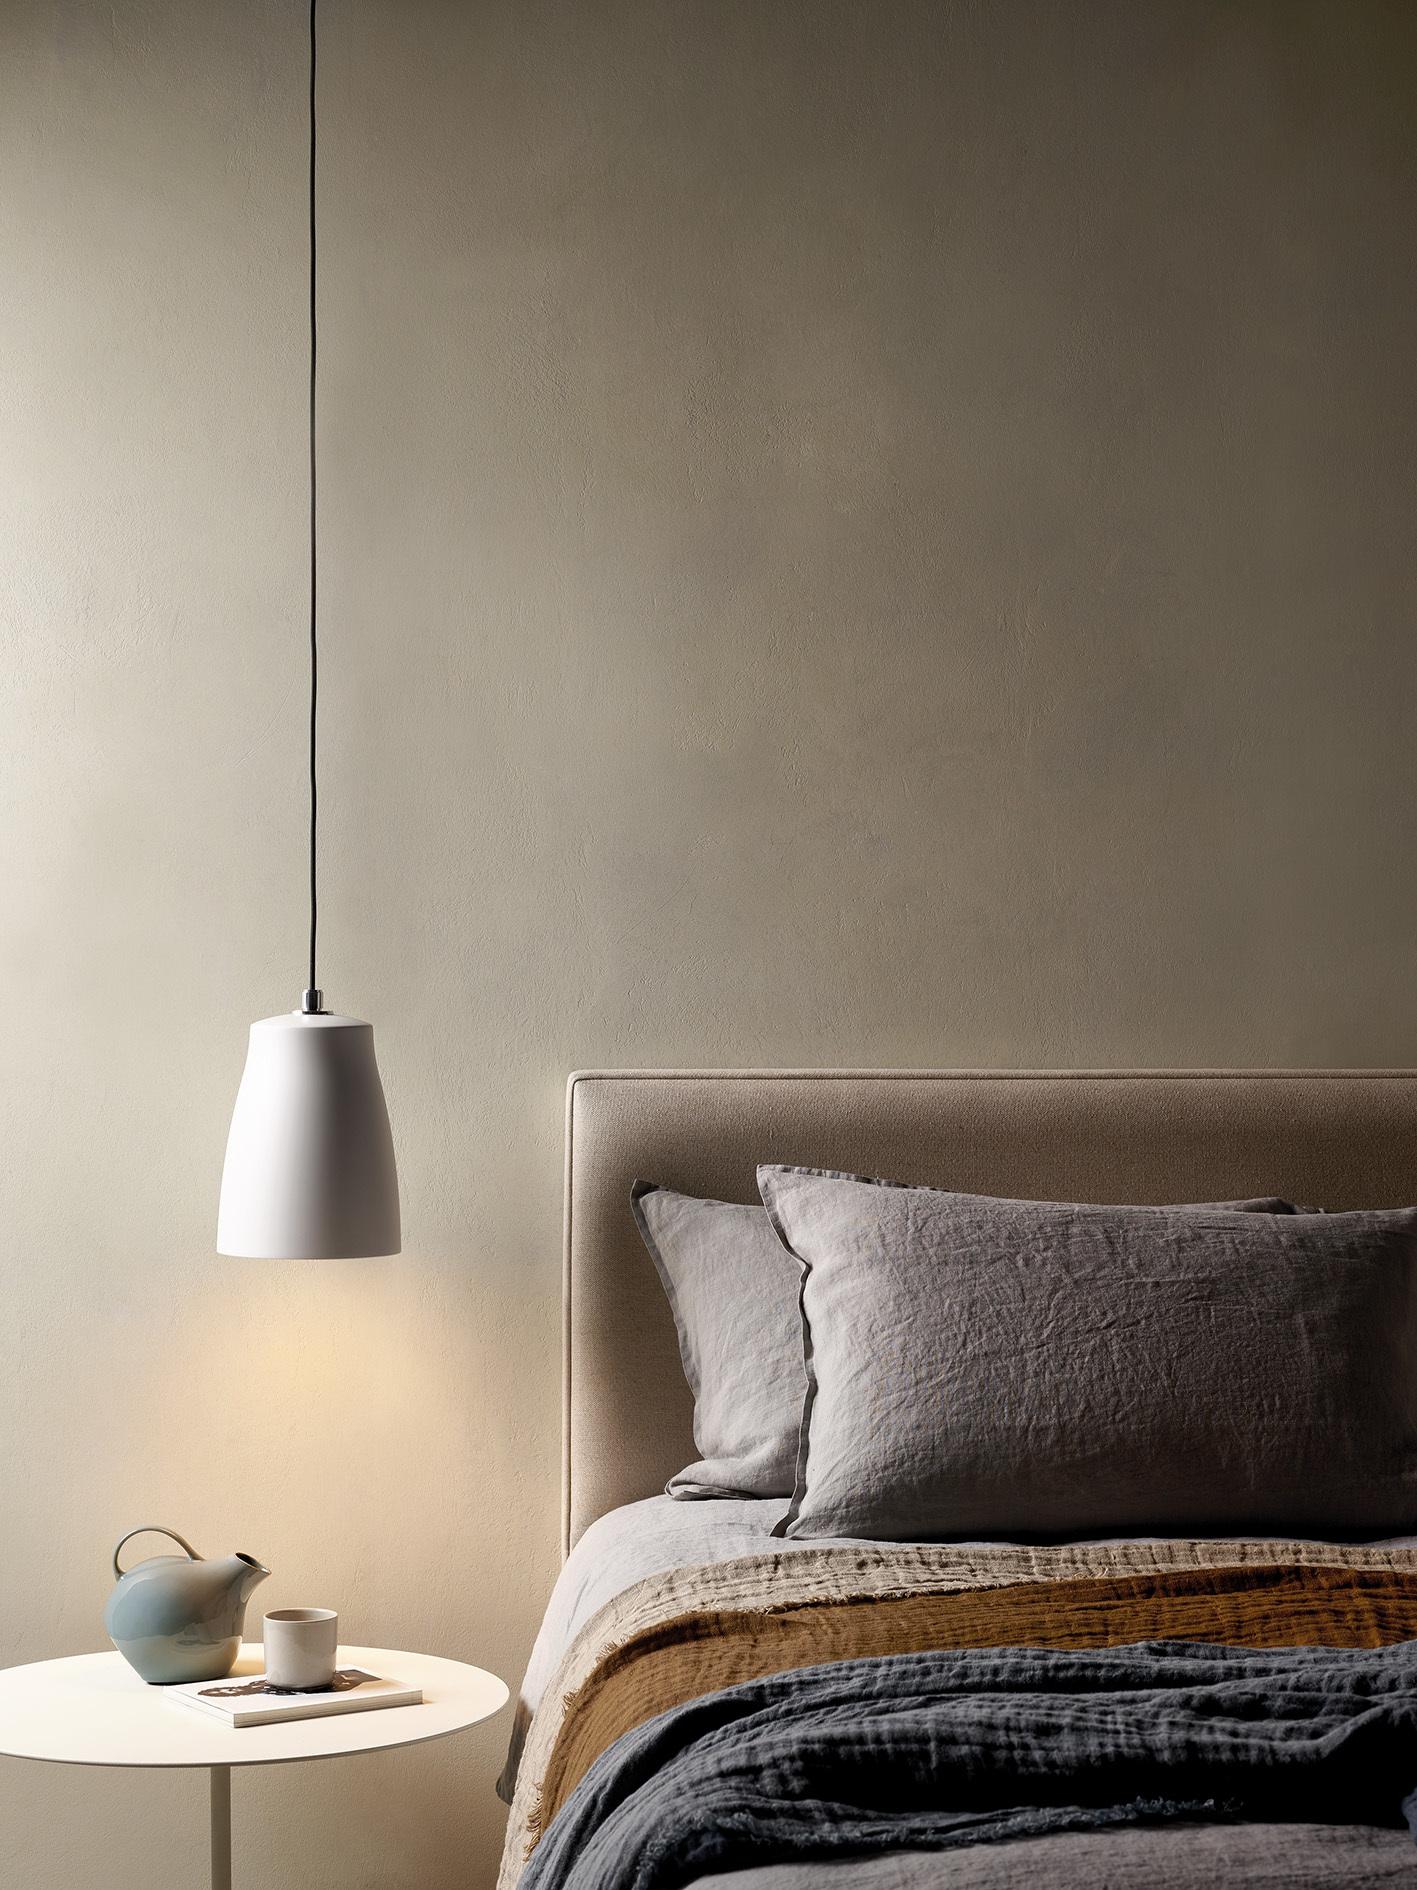 Подвесной светильник Astro Atelier 1224017 (7513), 1xE27x42W, алюминий, металл - фото 2